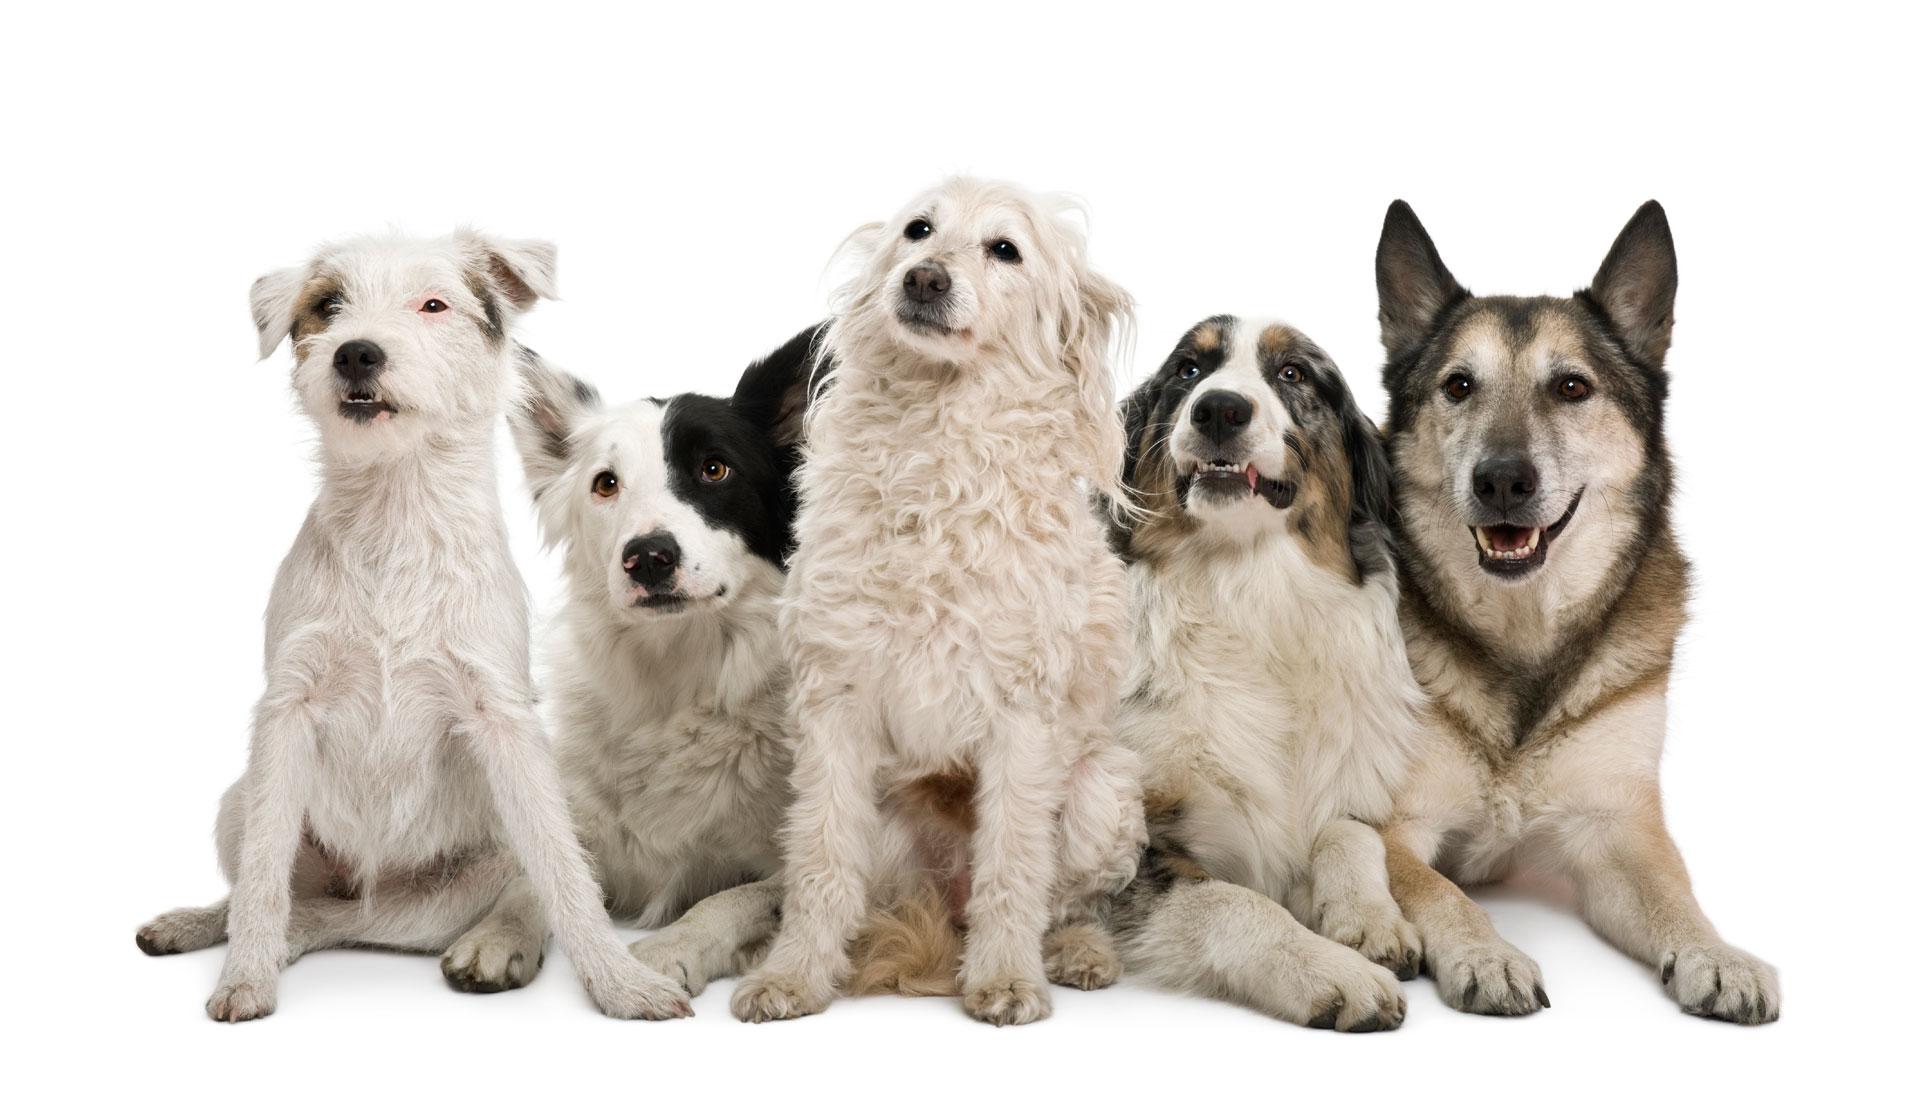 Salonen_dogs